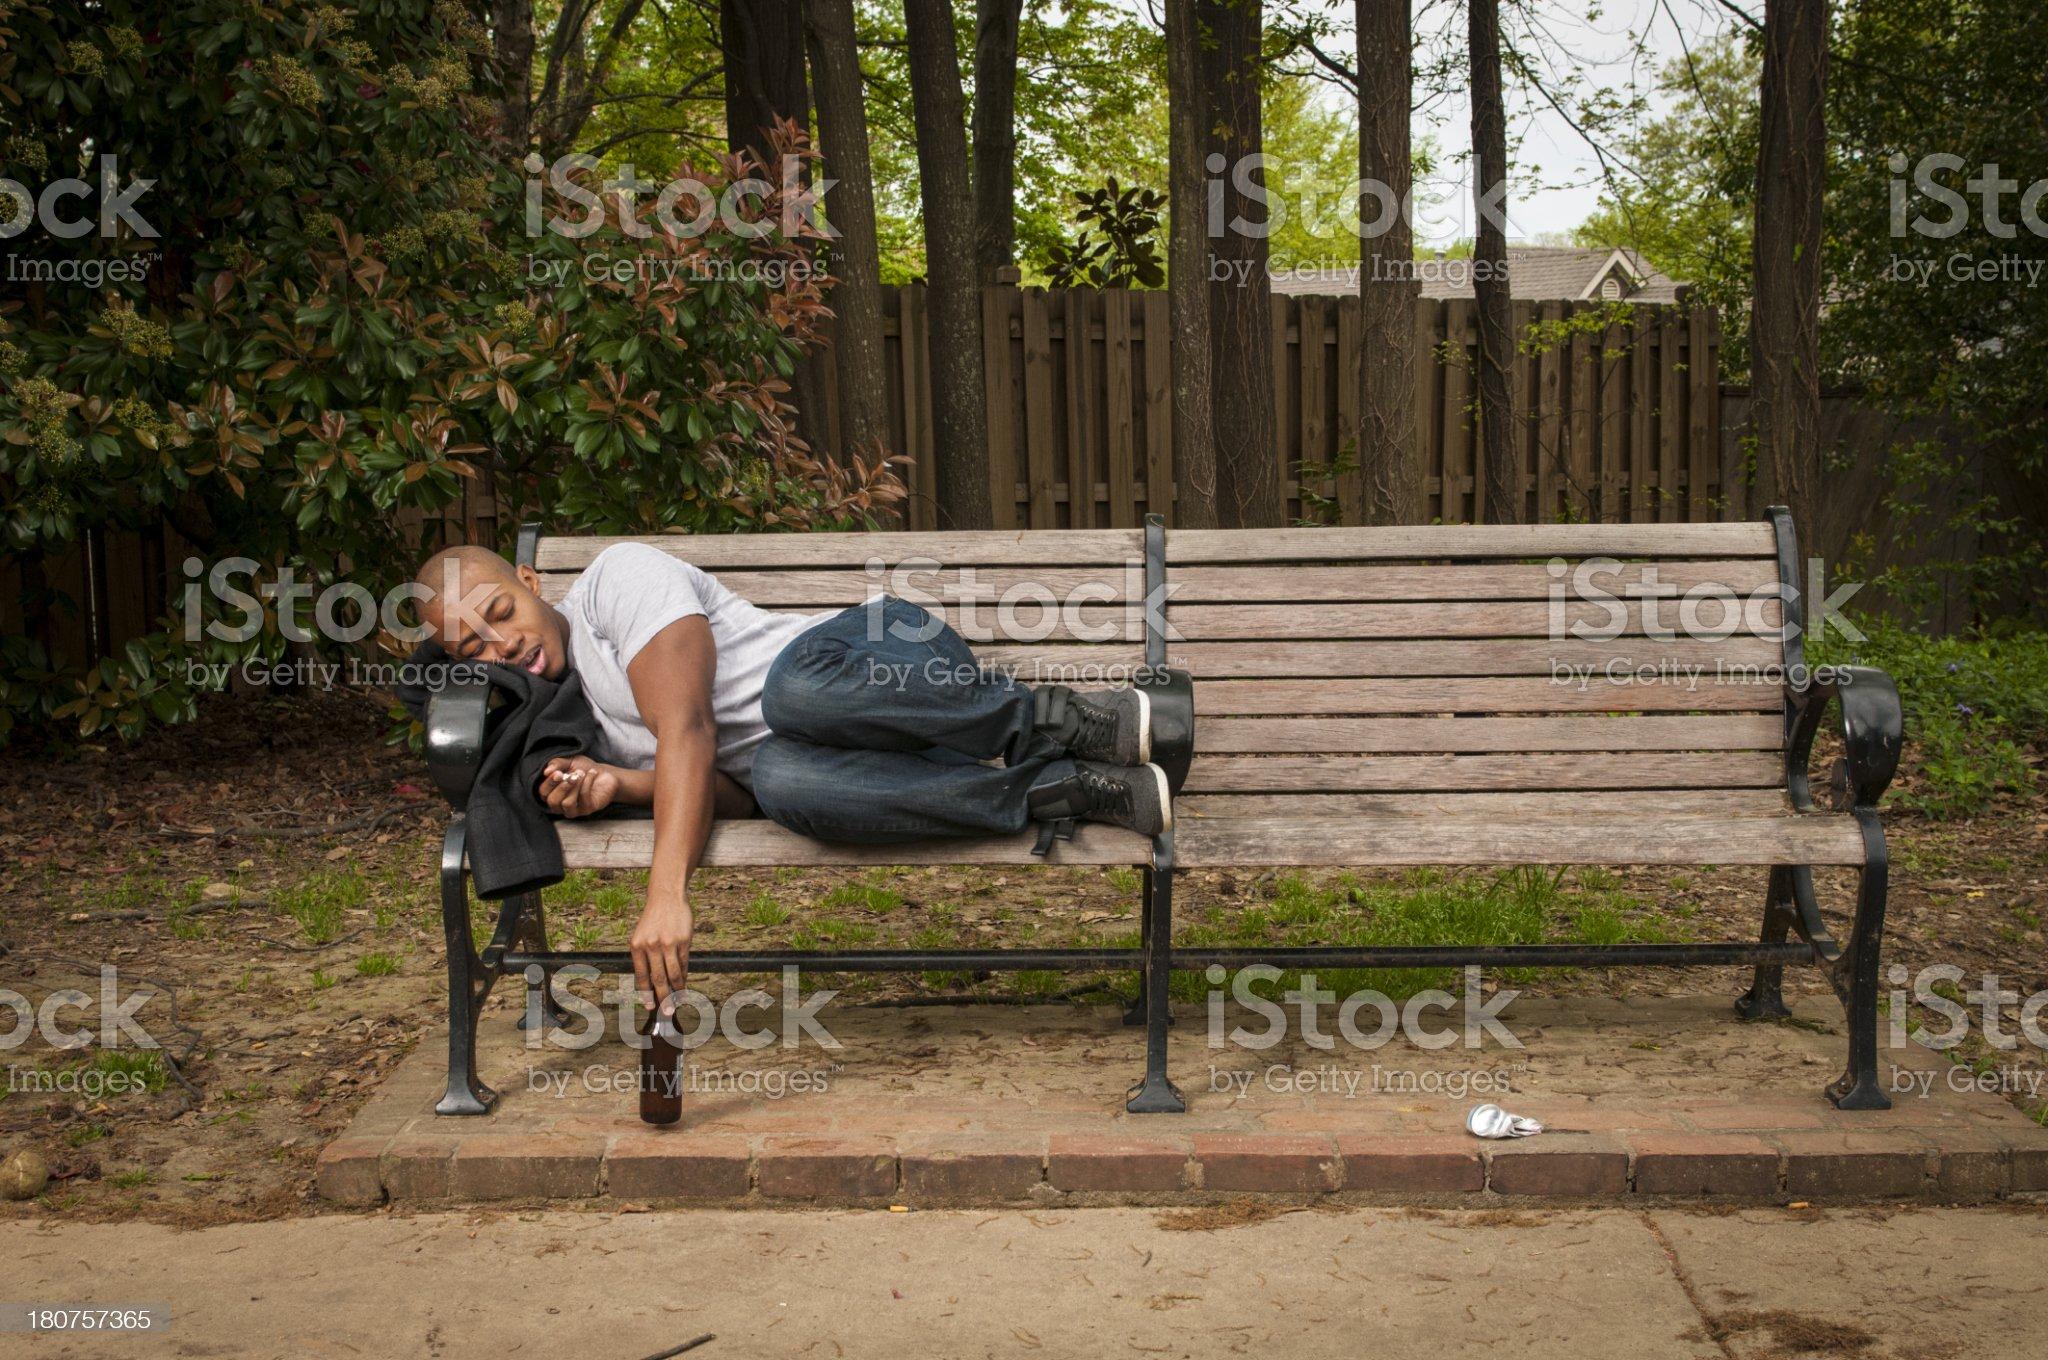 Man Sleeping on Park Bench royalty-free stock photo